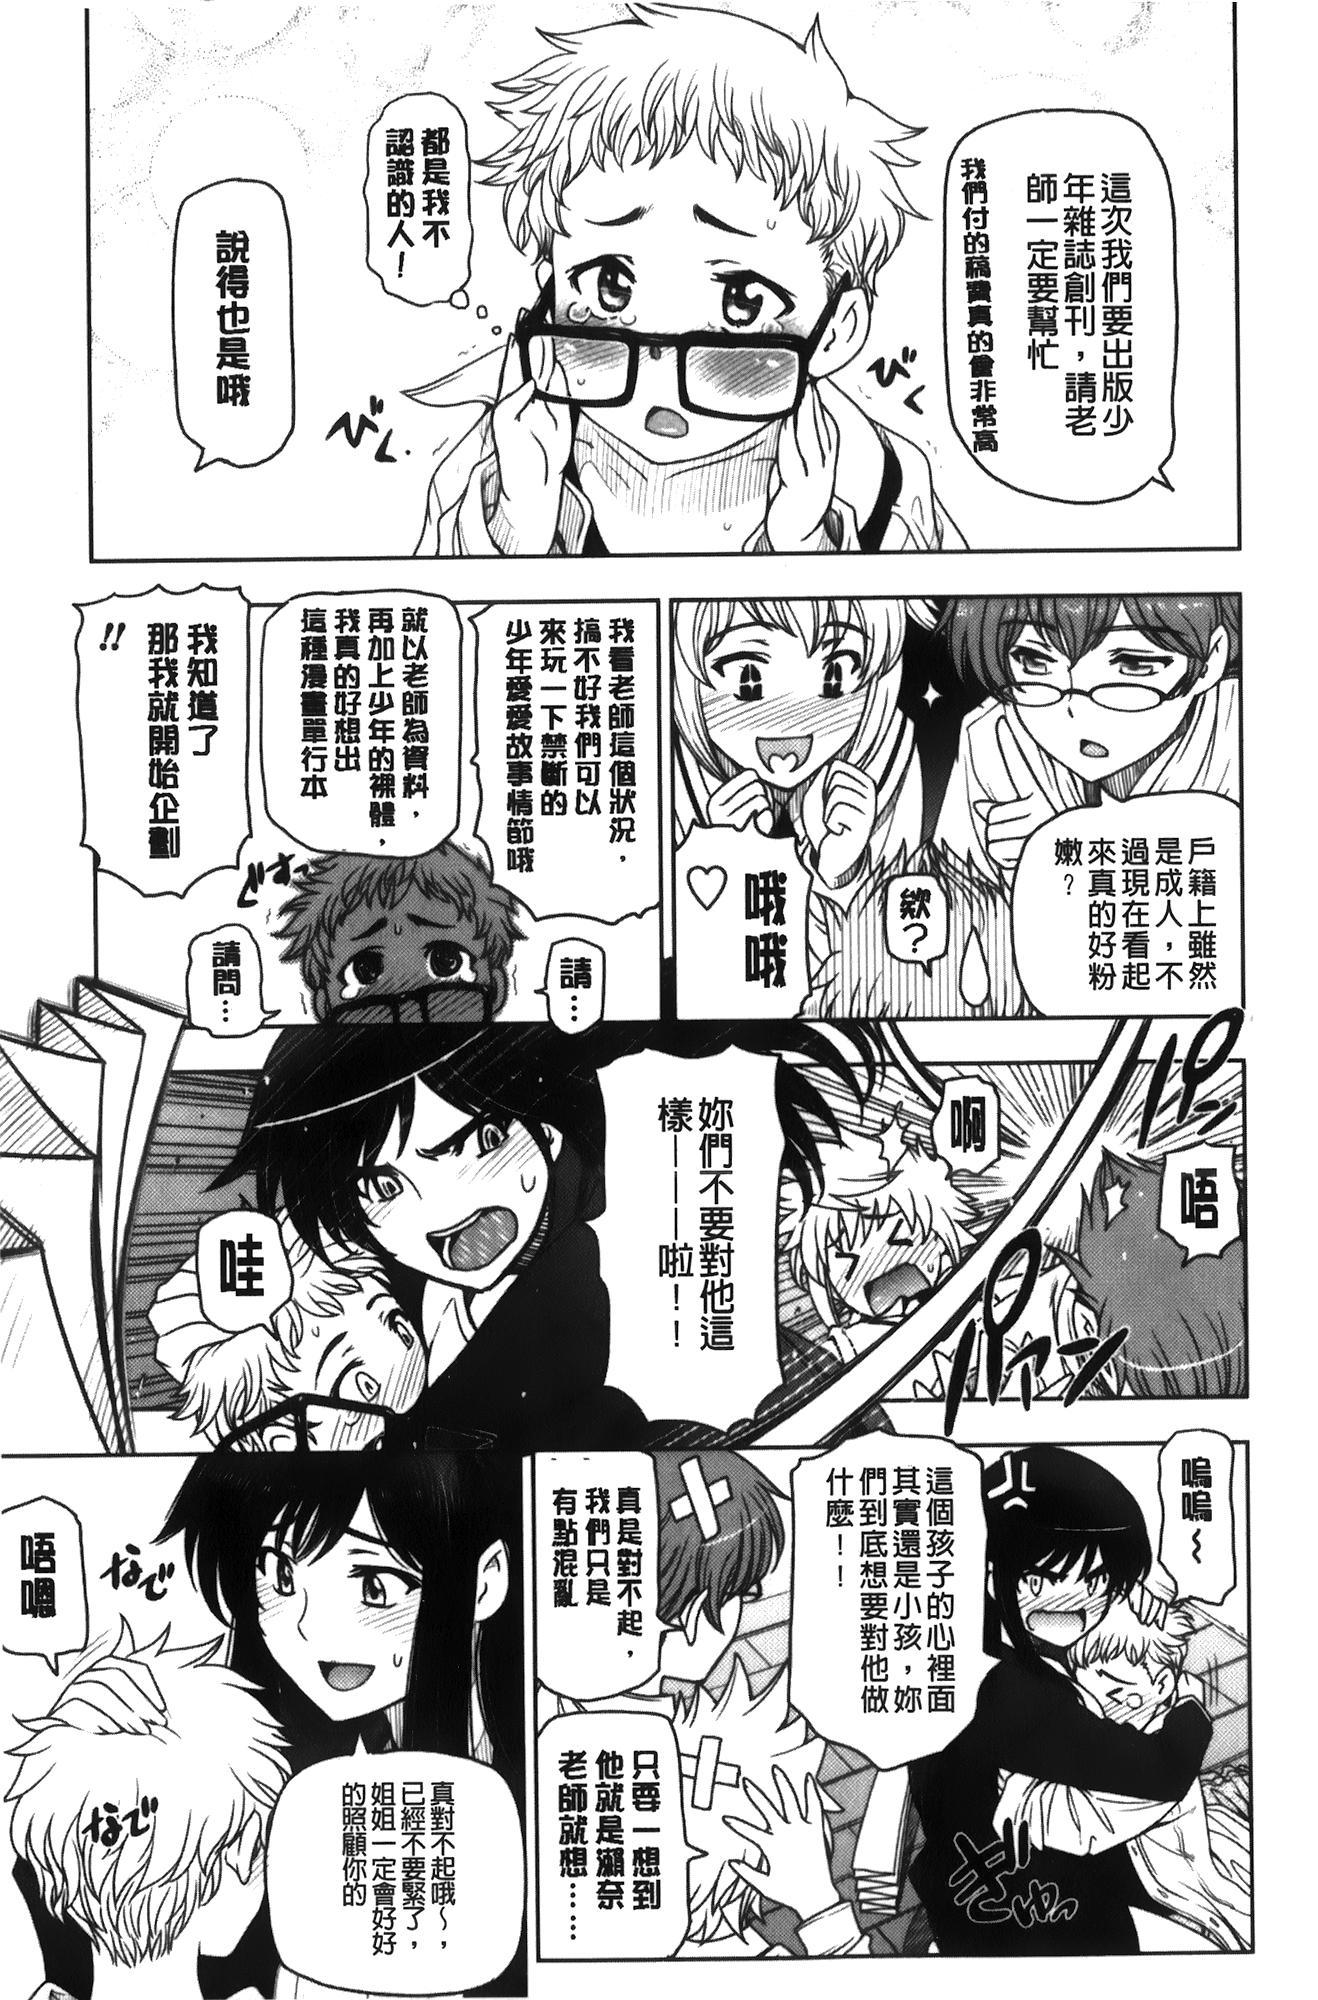 Majo × Shota ~ Genteiban | 魔女X小正太 限定版 239